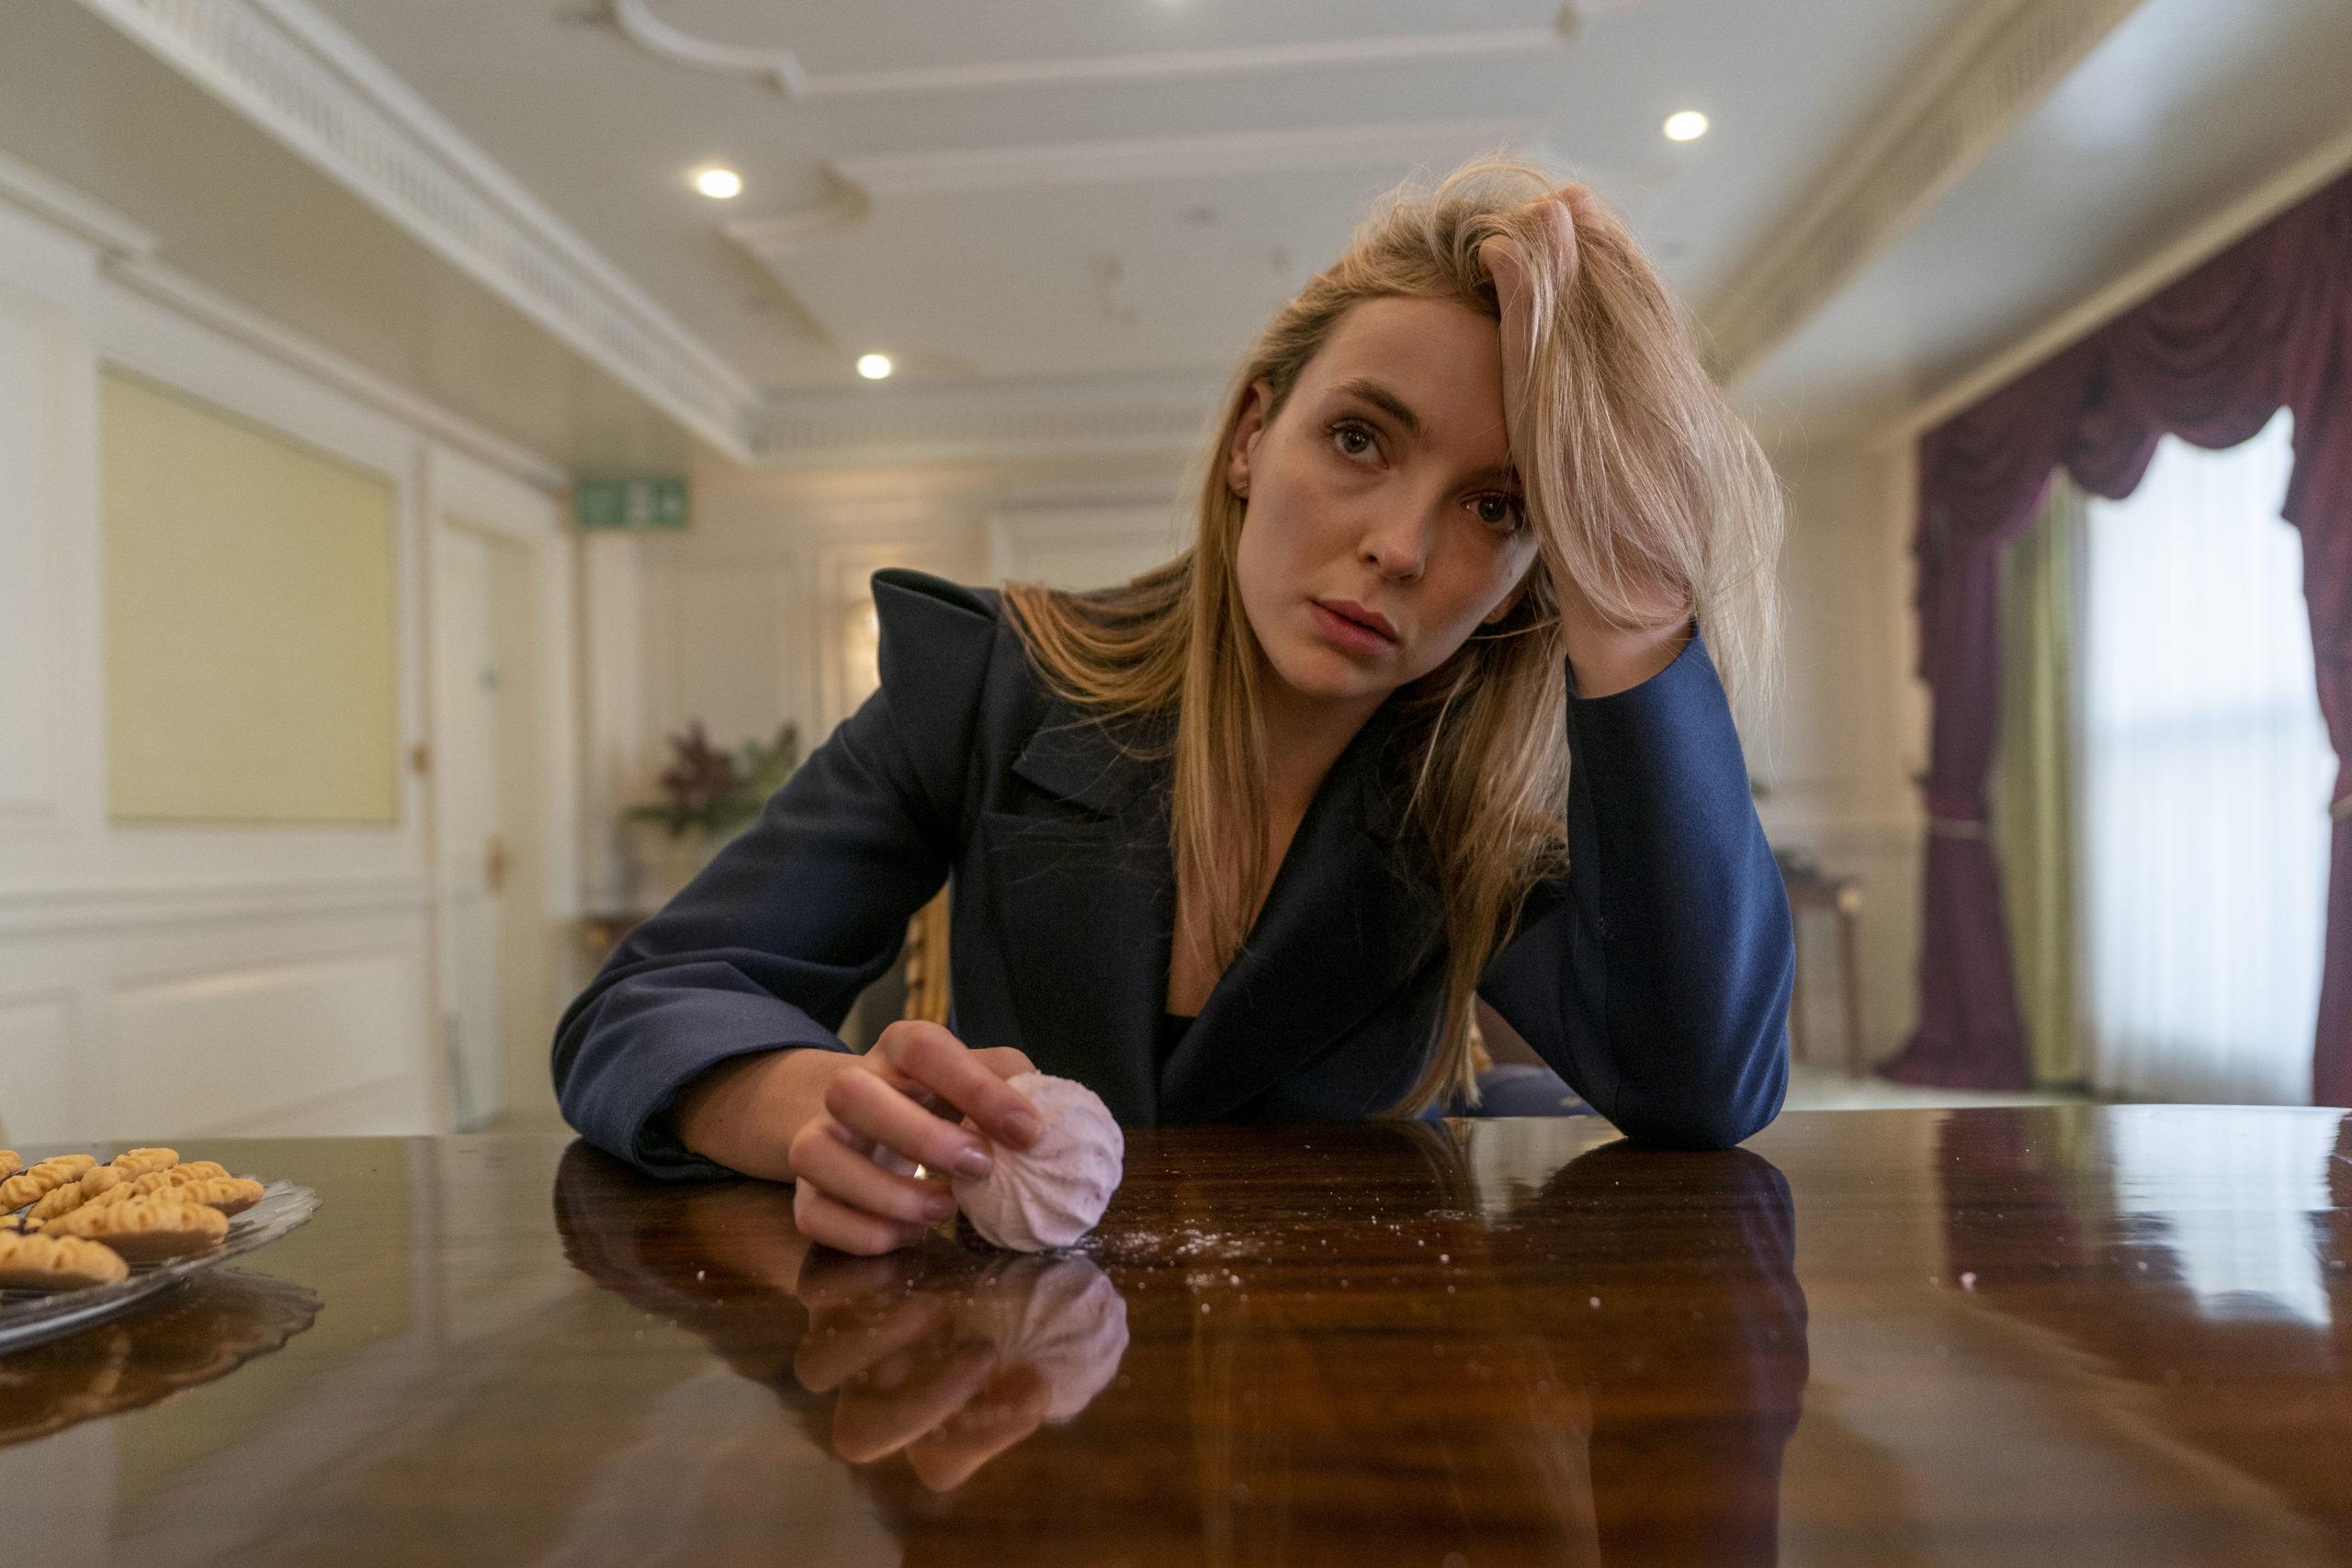 Jodie Comer as Villanelle in Killing Eve